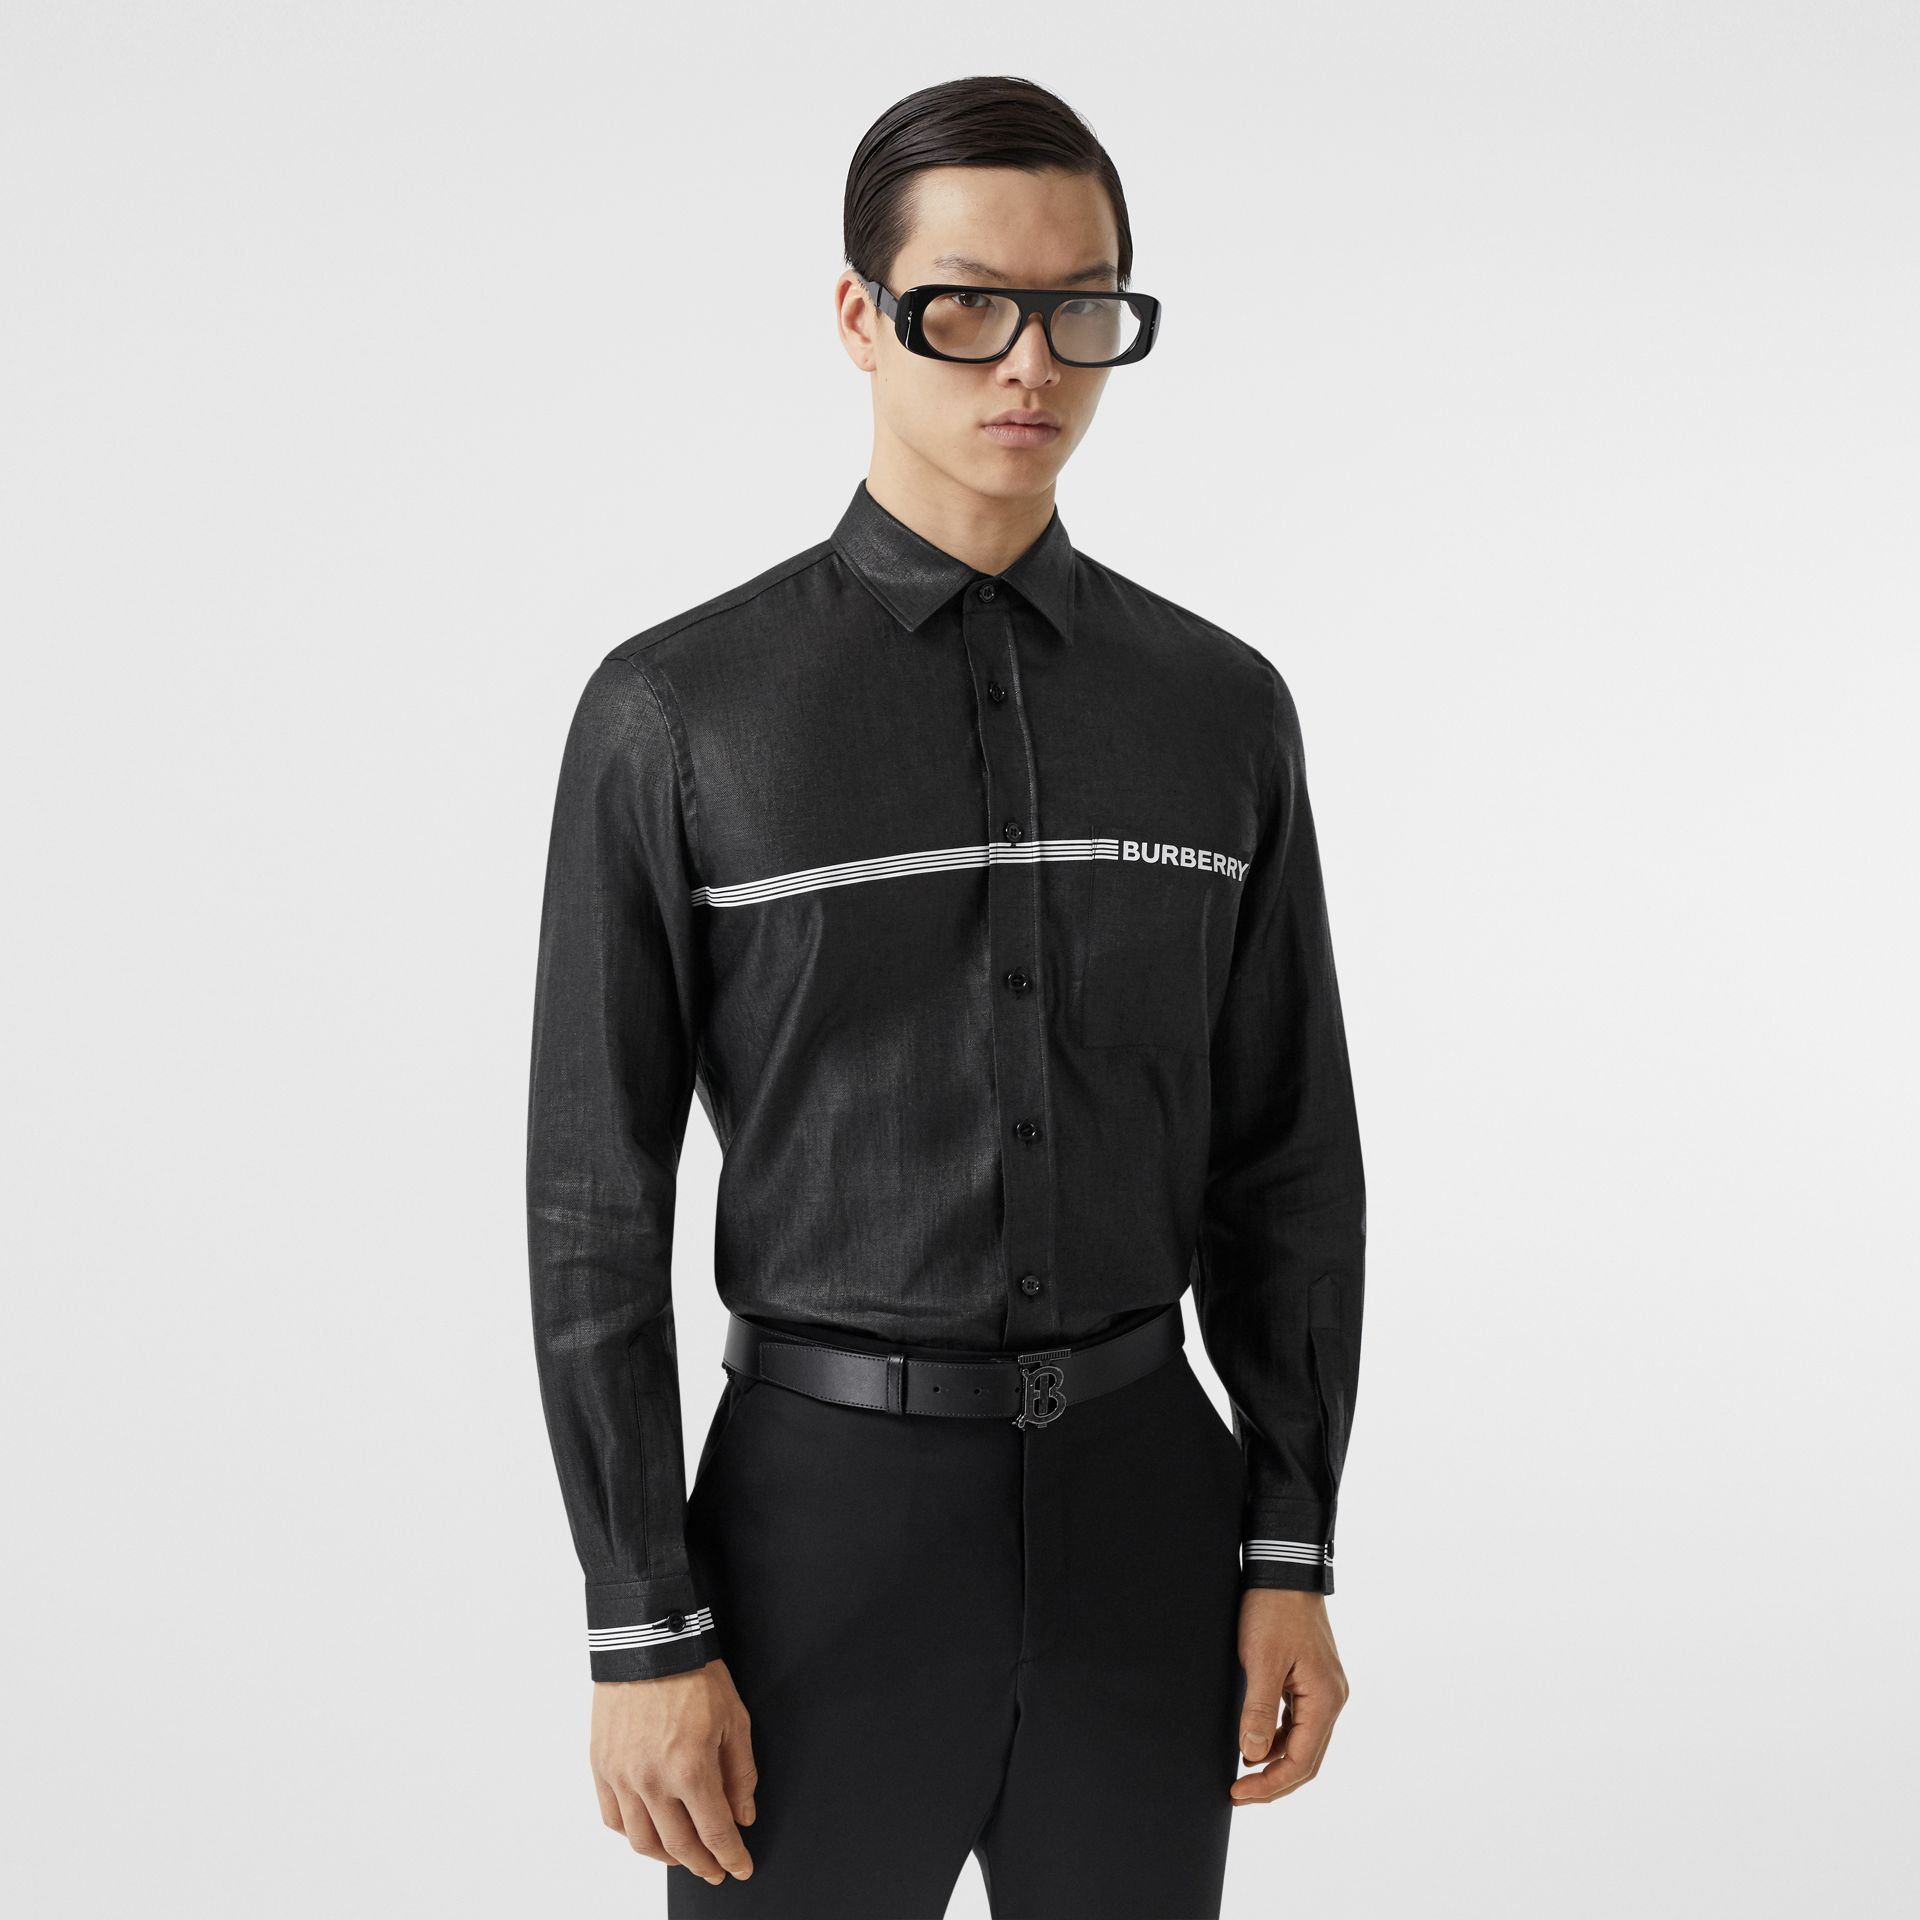 Logo Print Linen Blend Shirt in Black | Burberry - gallery image 0